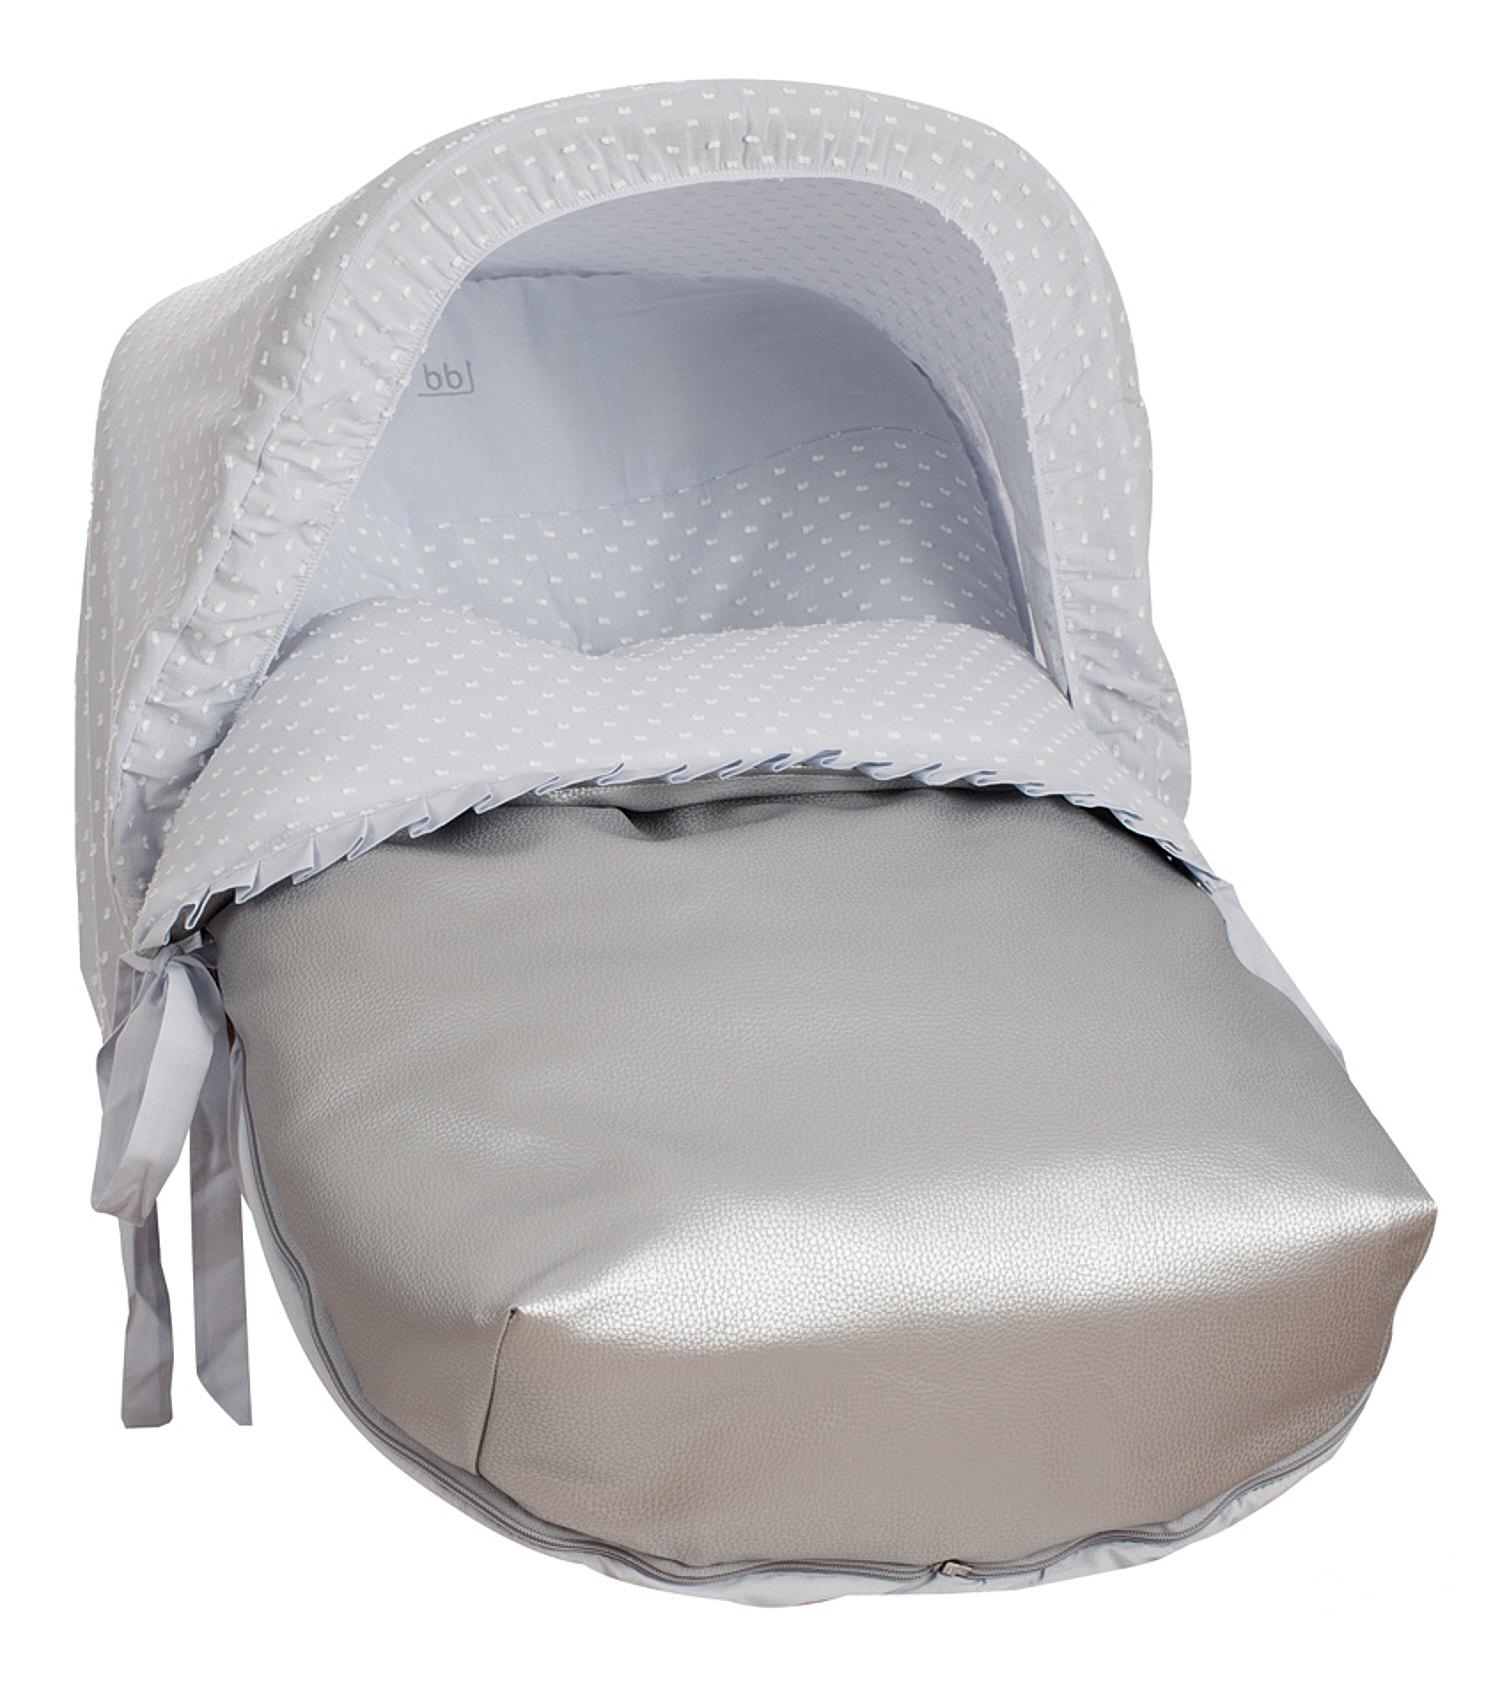 Saco Porta bebé Plumeti Gris (capota no incluida)